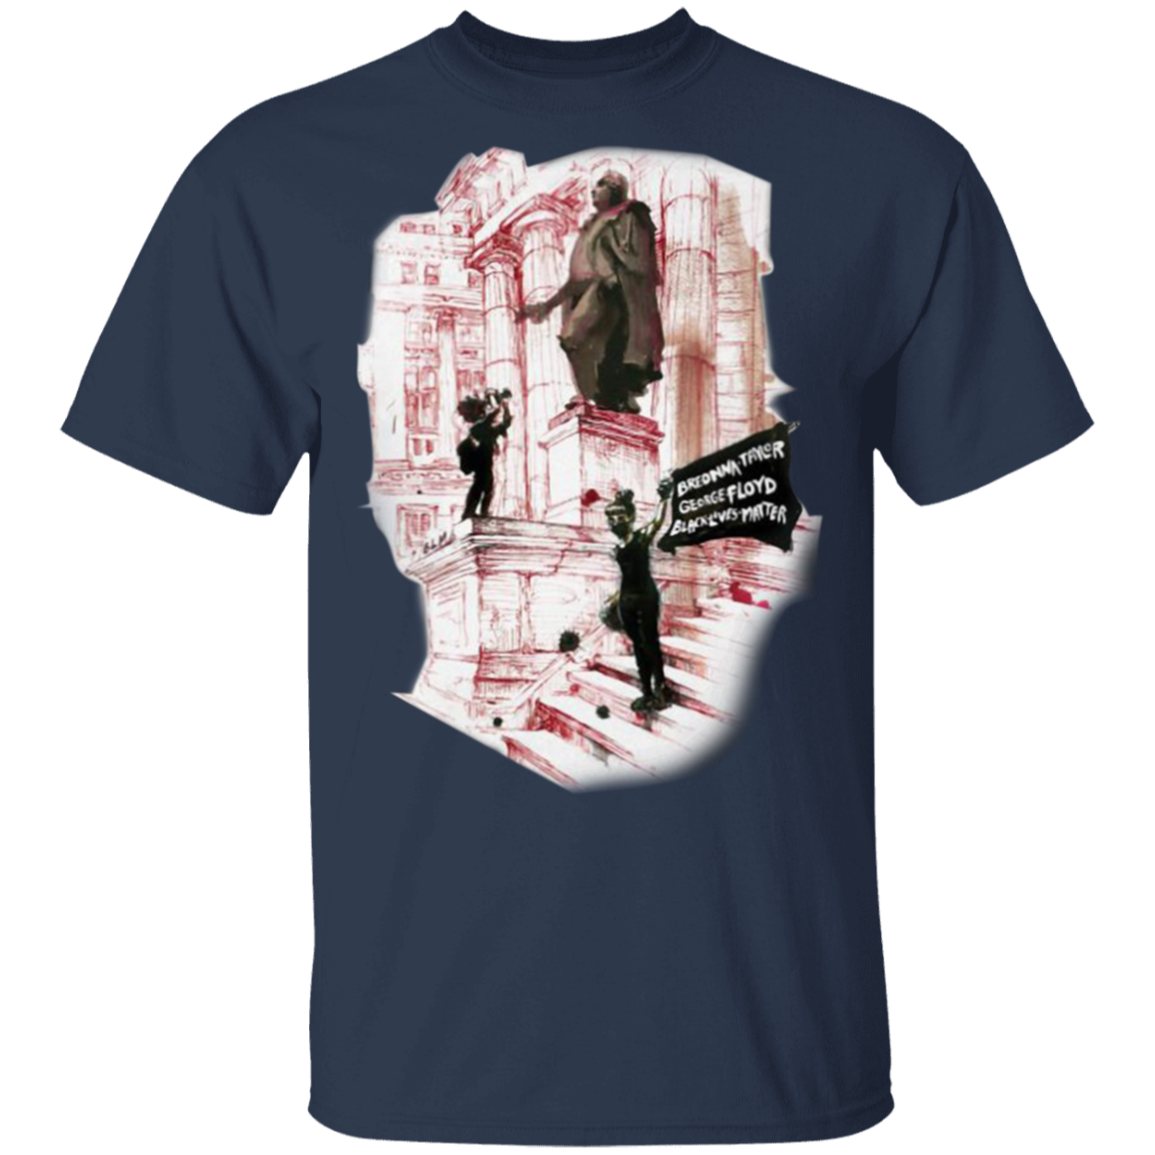 Breonna Taylor George Floyd Blm Shirt Justice For Breonna Taylor Navy 5xl In 2021 Printed Shirts Shirts Long Sleeve Shirts